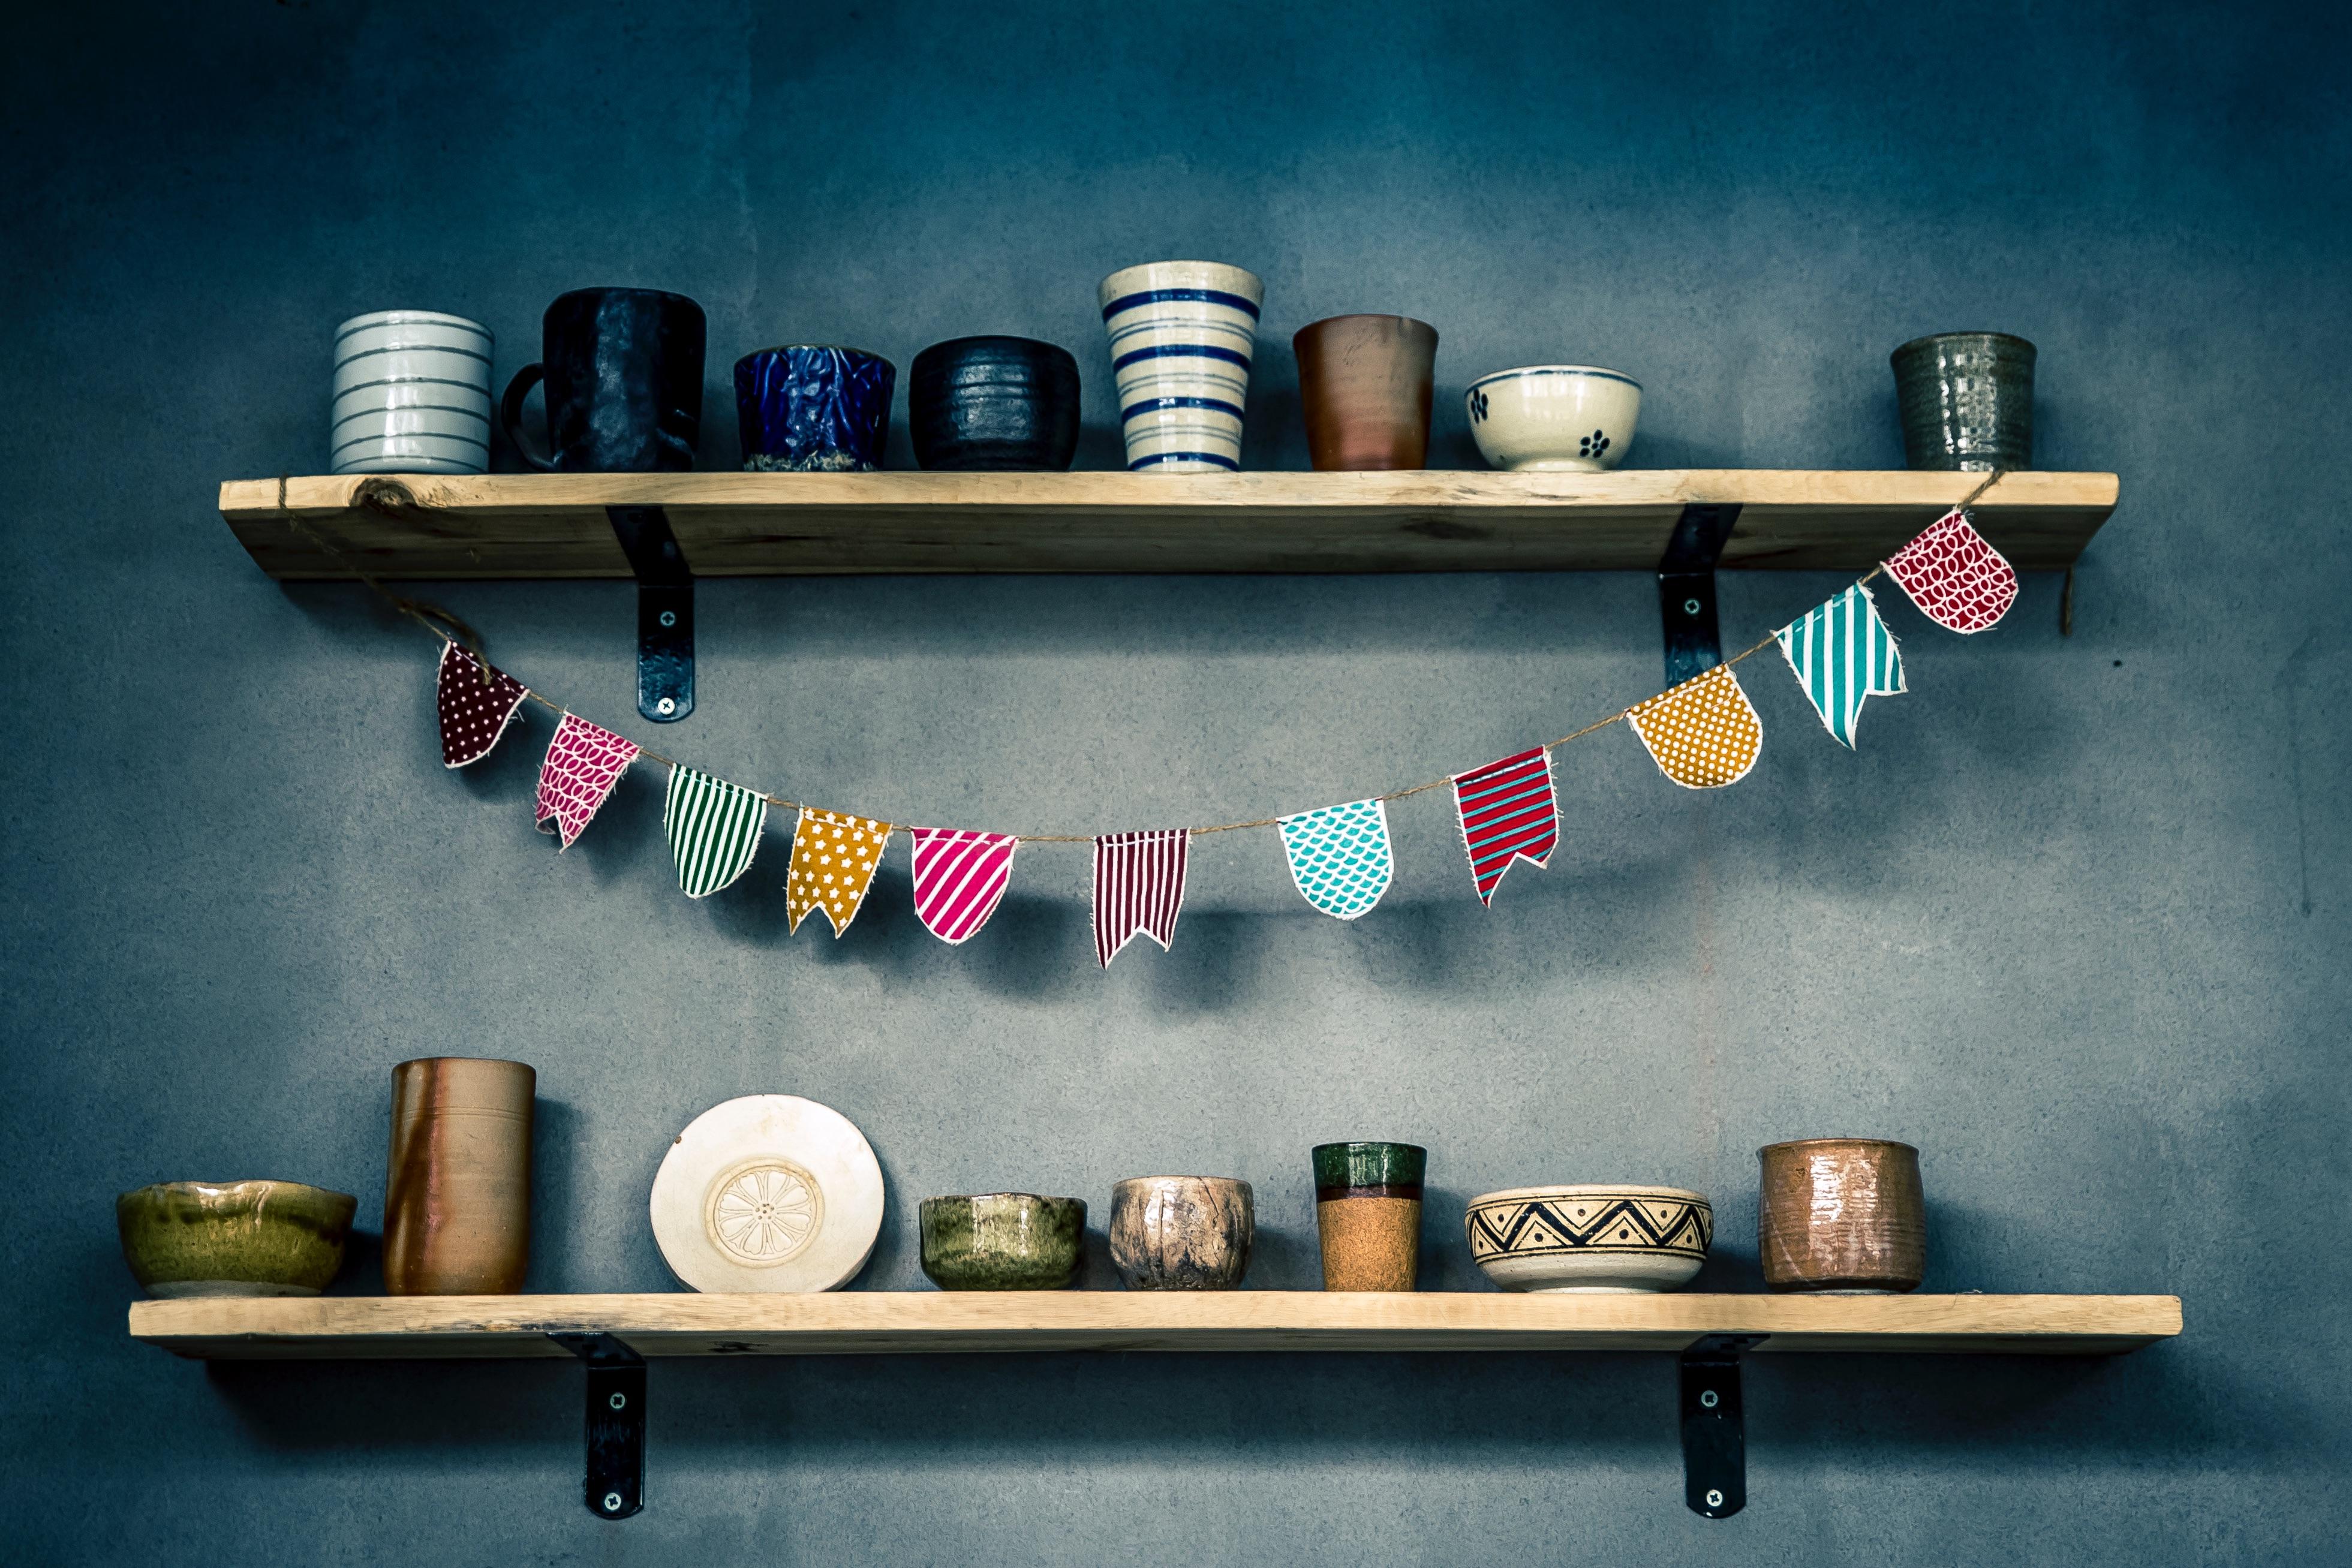 Super Kostenlose foto : Pot, Tasse, Keramik, Regal, Möbel, Becher &JD_78